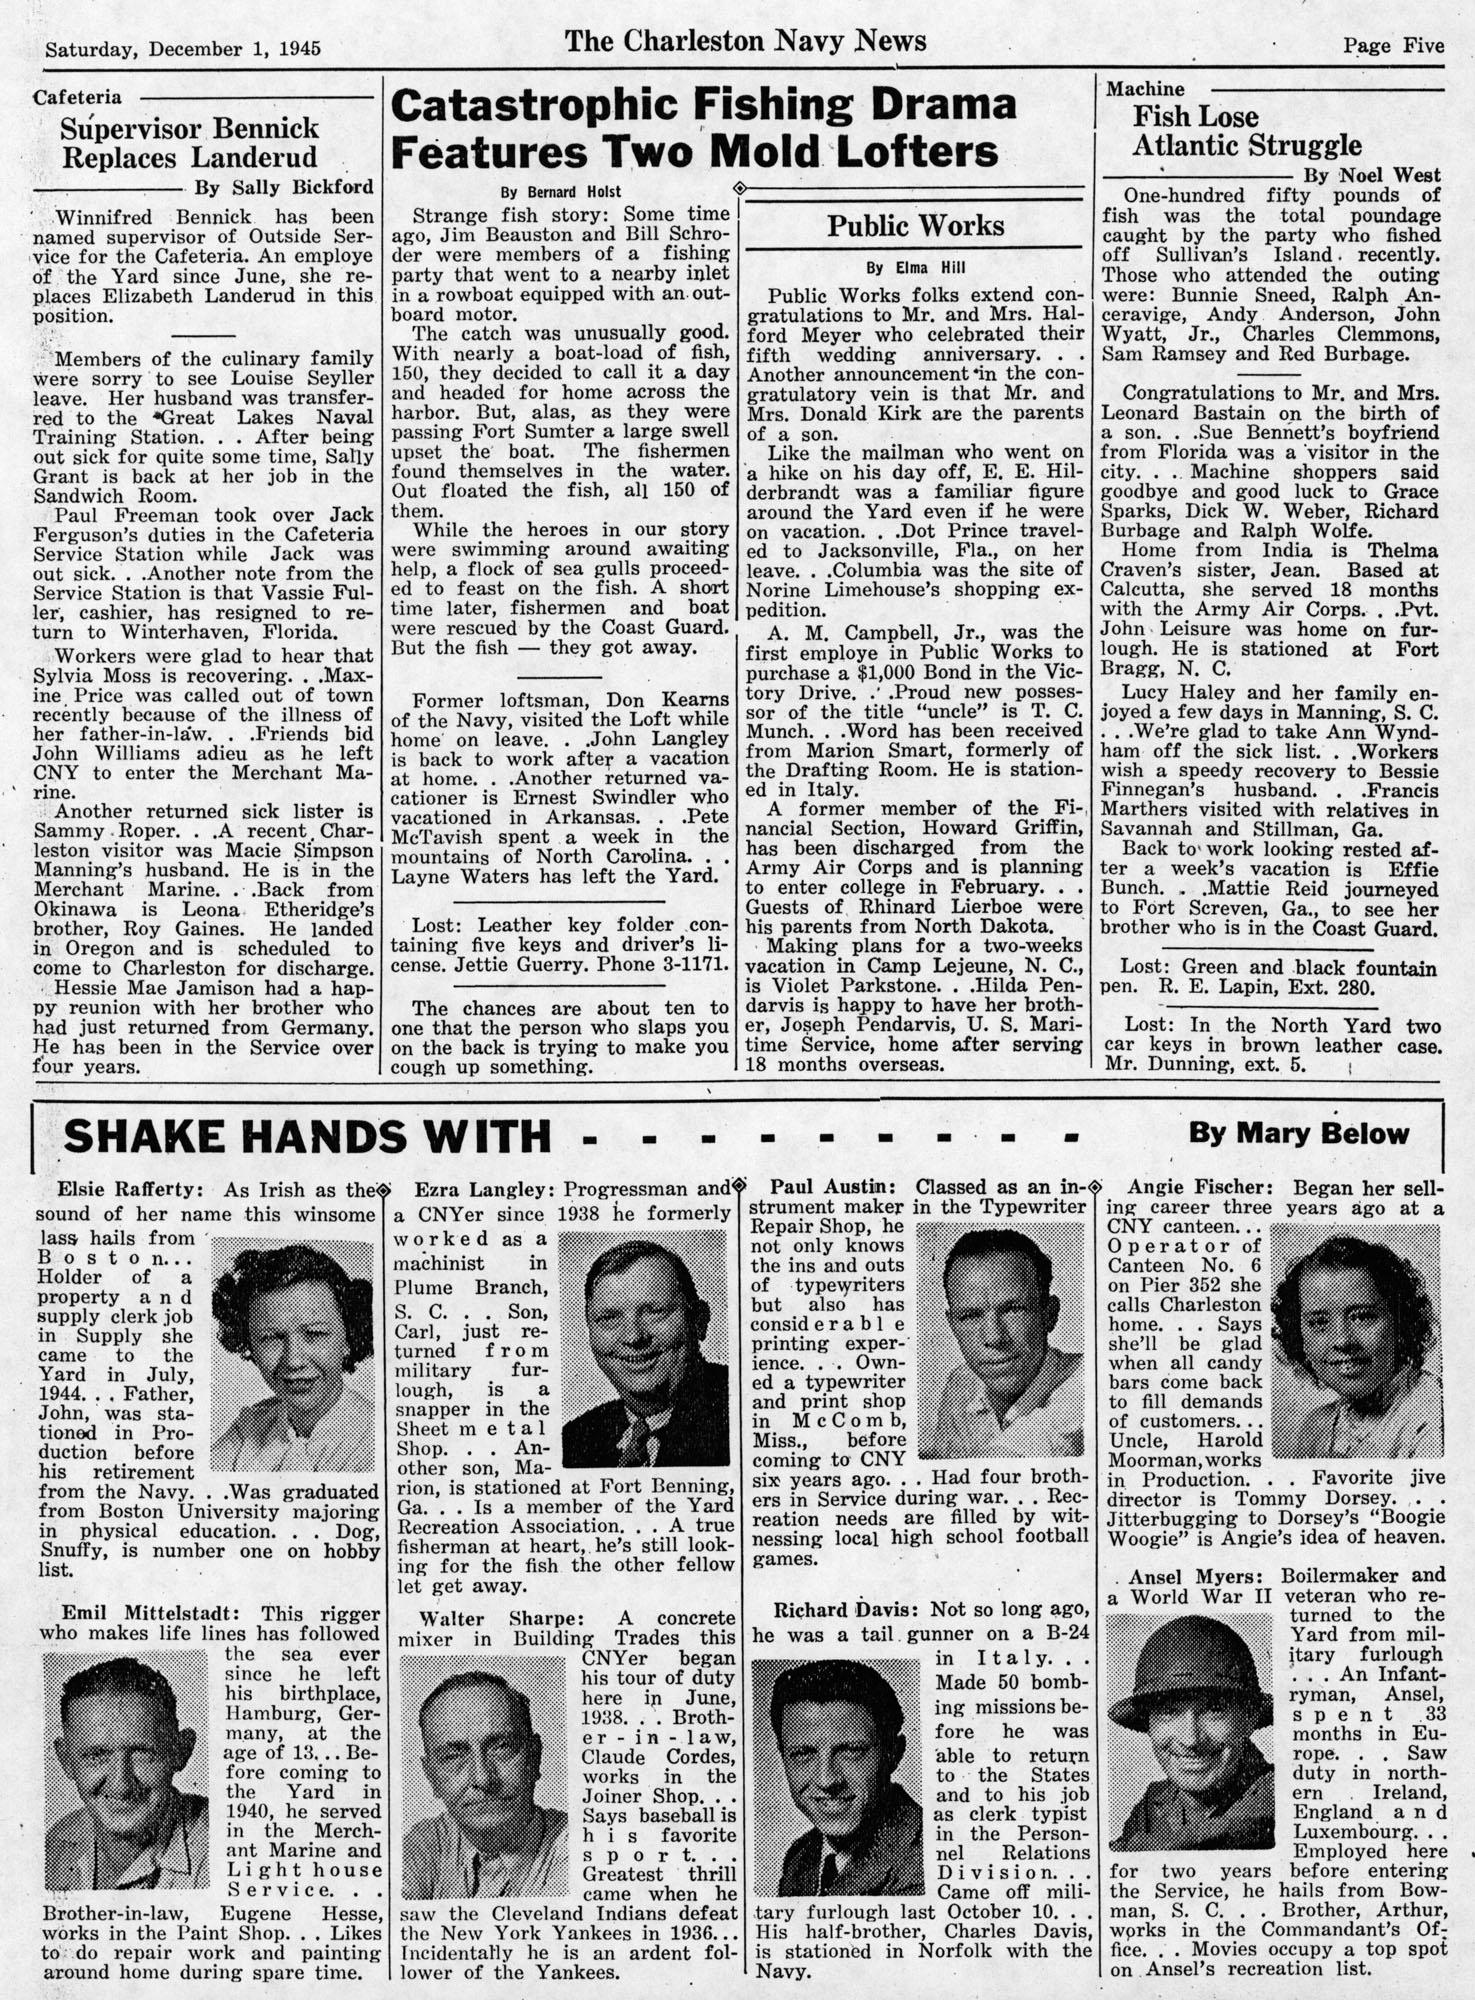 The Charleston Navy News, Volume 4, Edition 11, page v